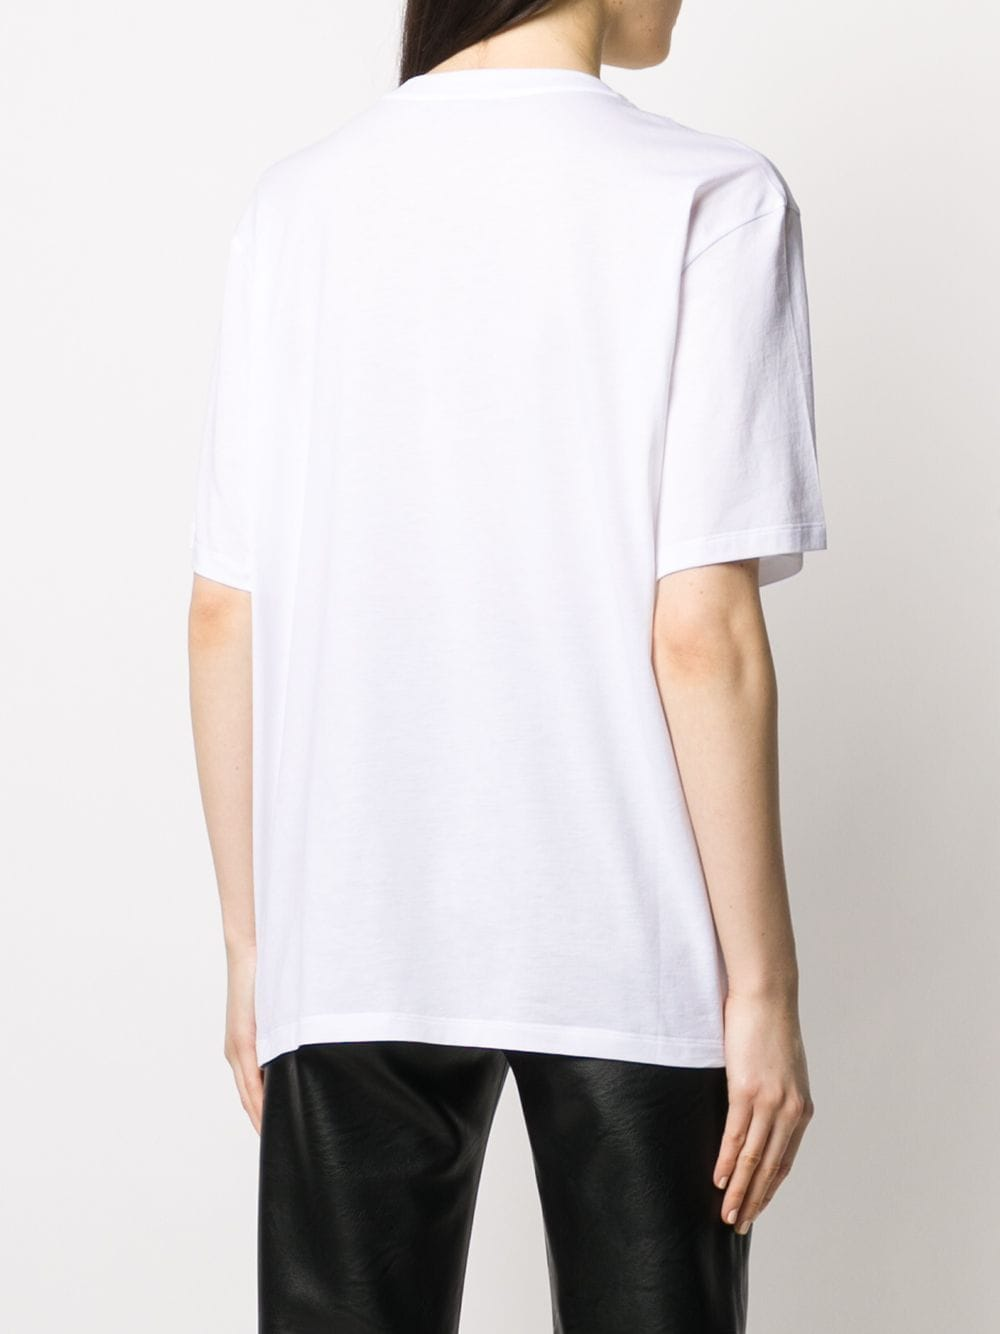 white cotton short sleeves logo t.shirt STELLA MC CARTNEY      511240-SNW639000